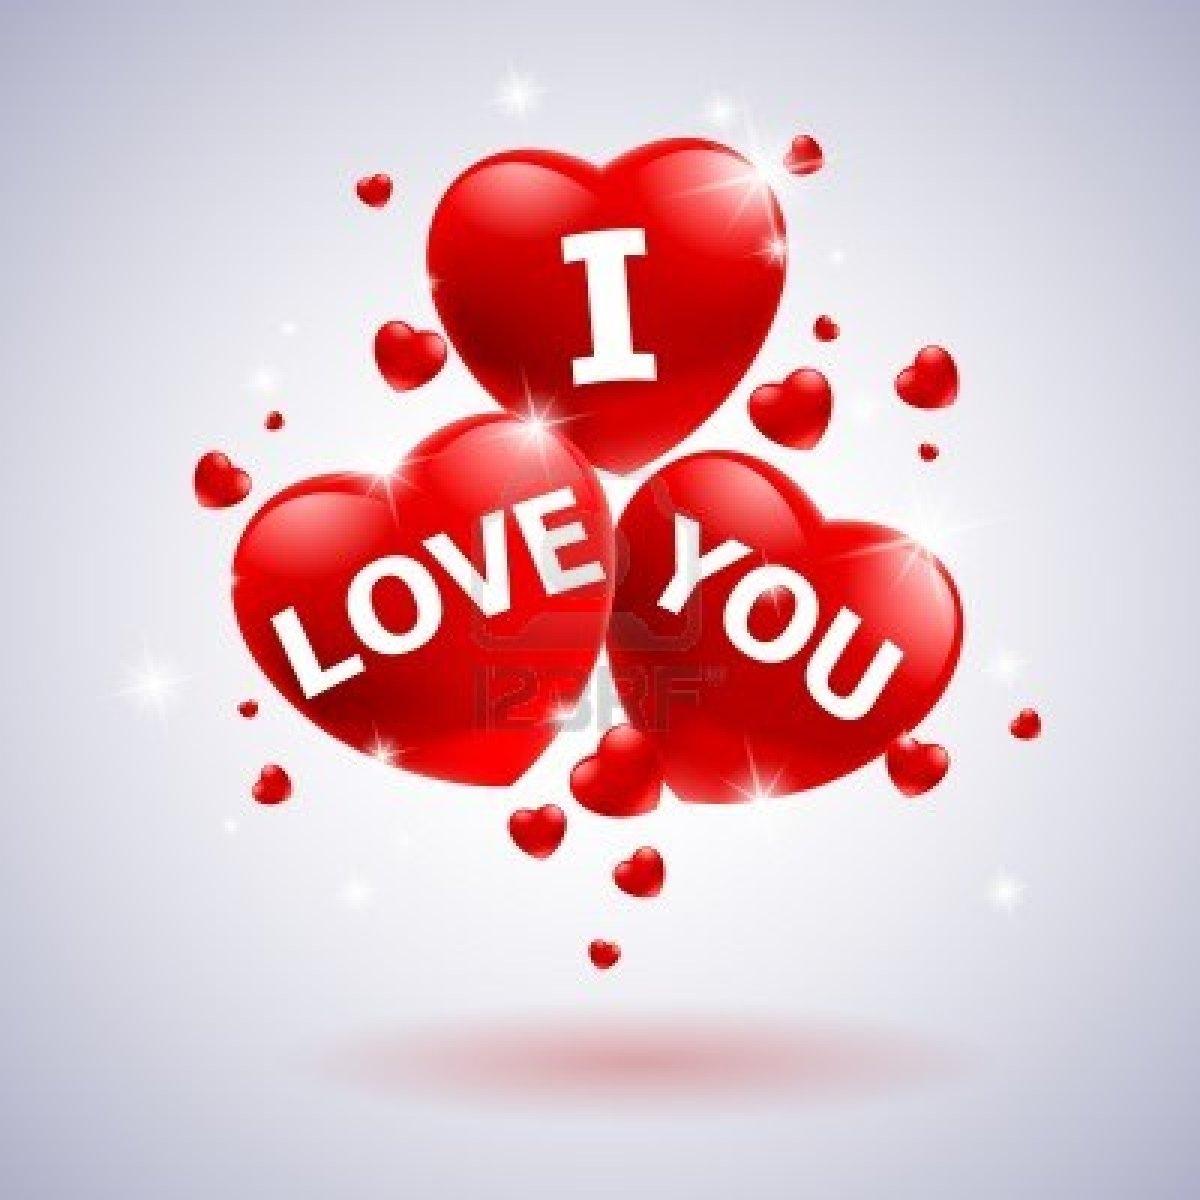 i love you images - bdfjade